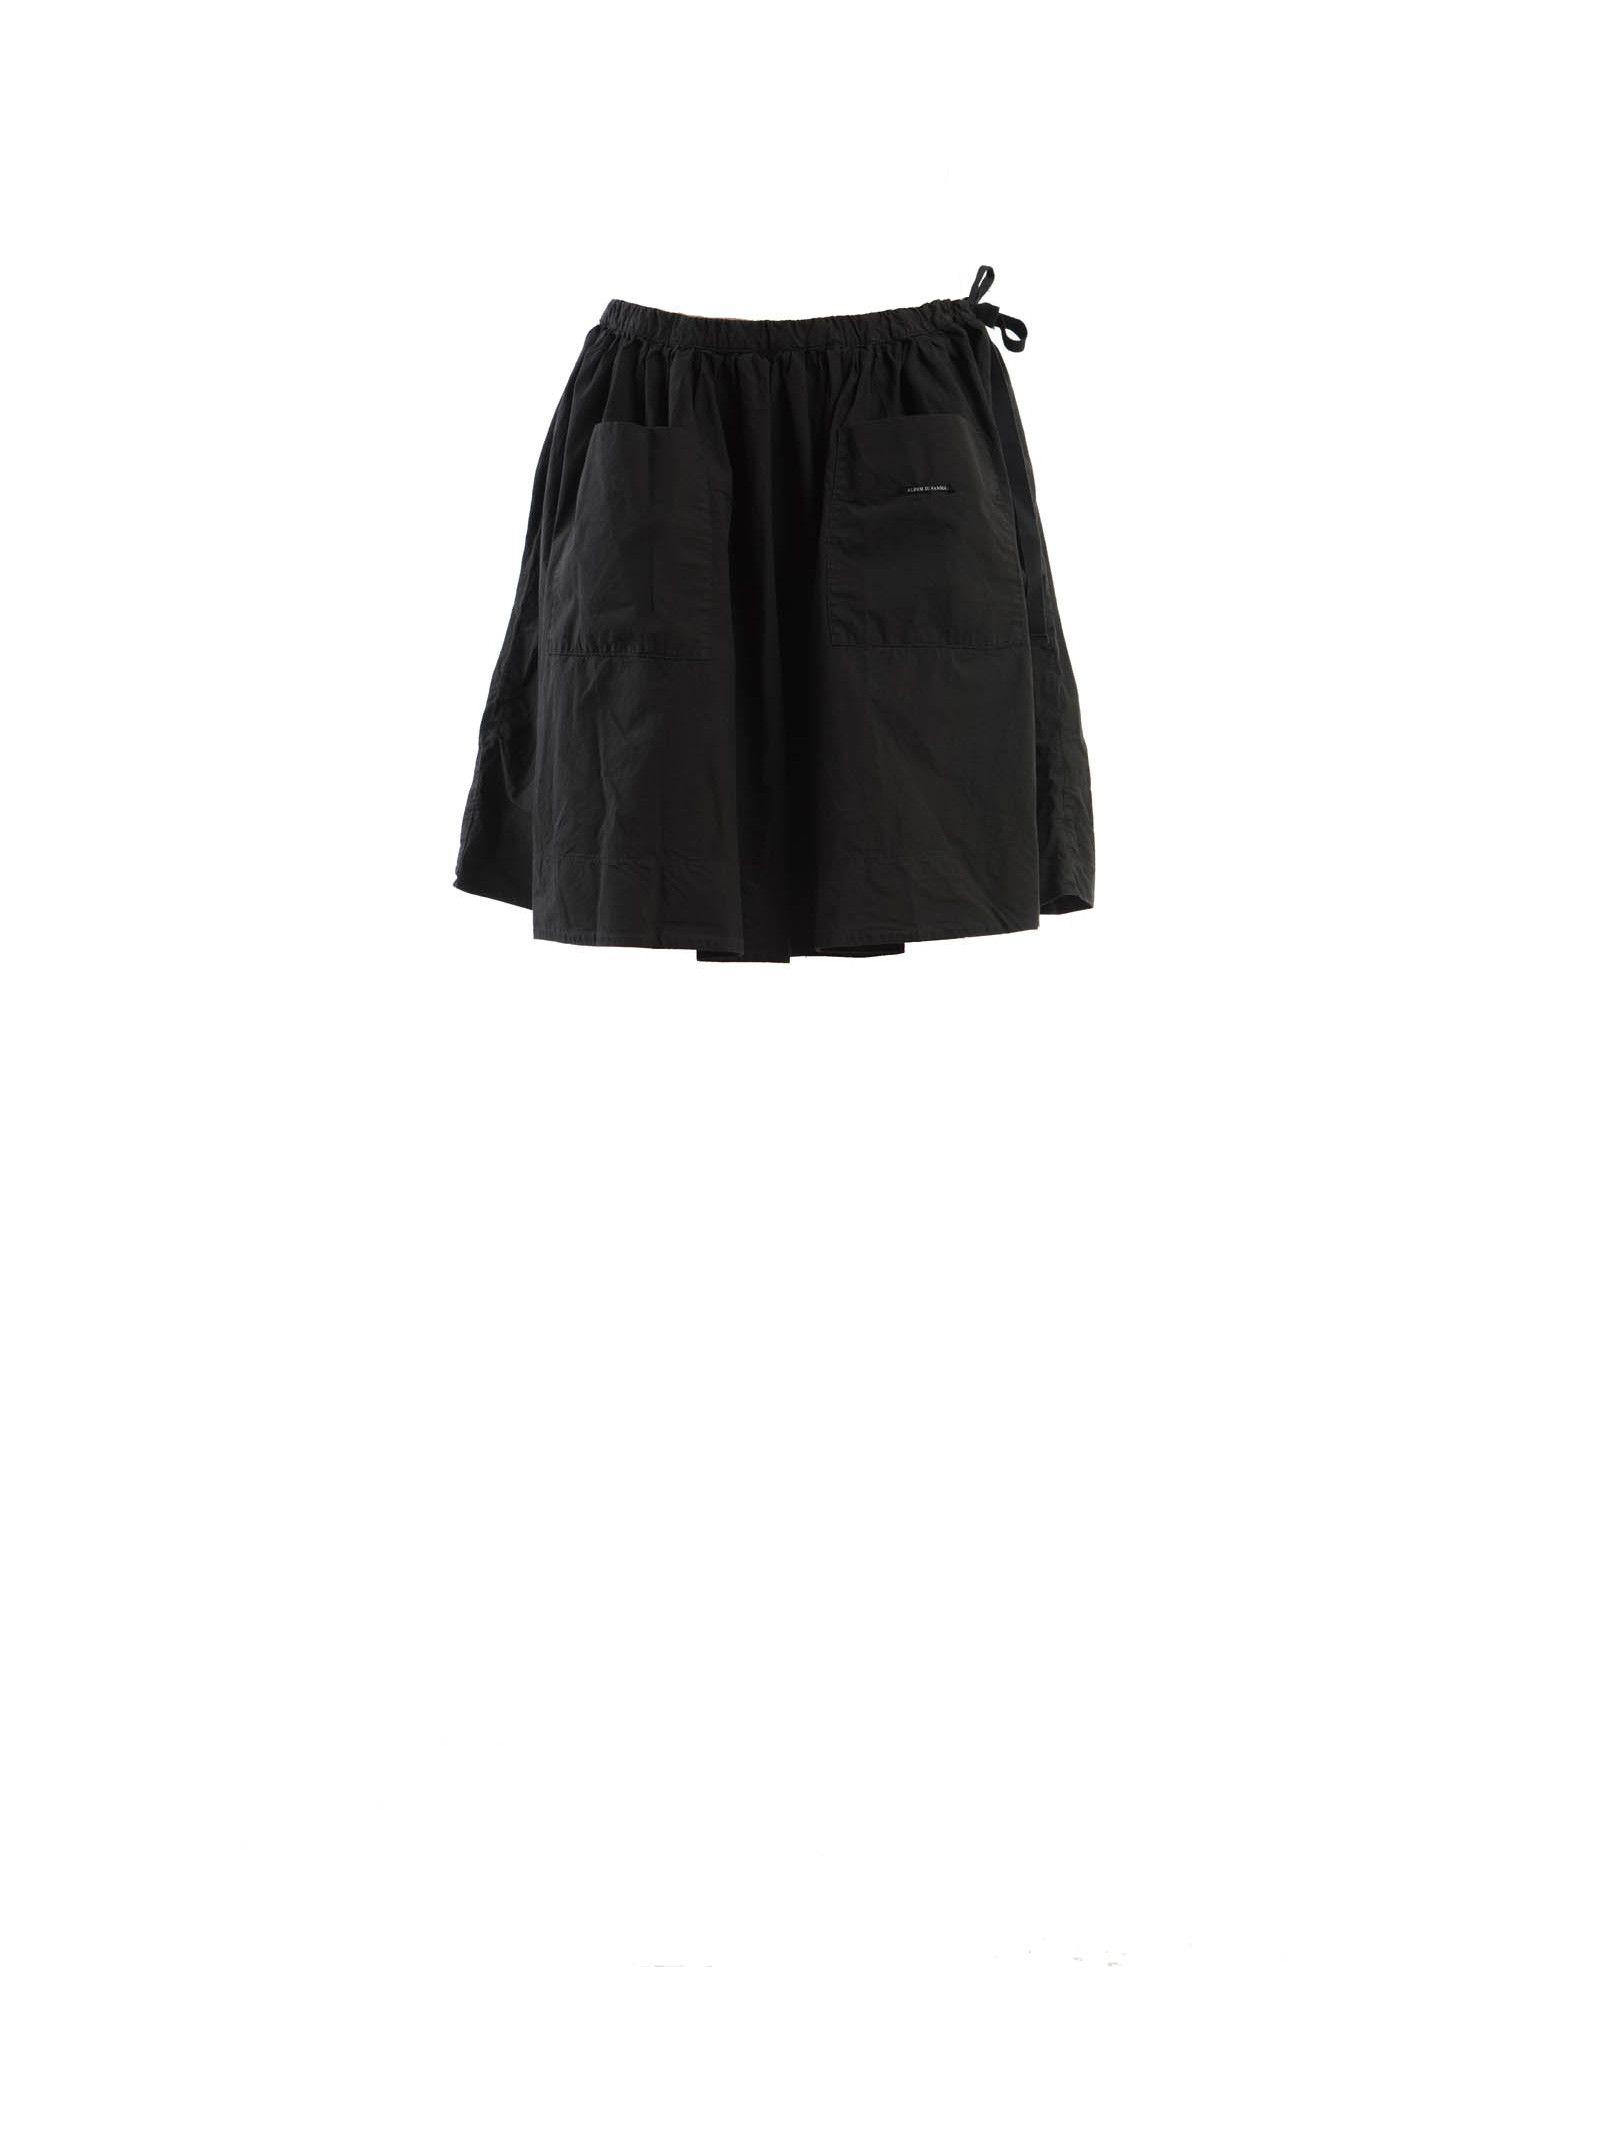 Album Di Famiglia Short Cotton Skirt